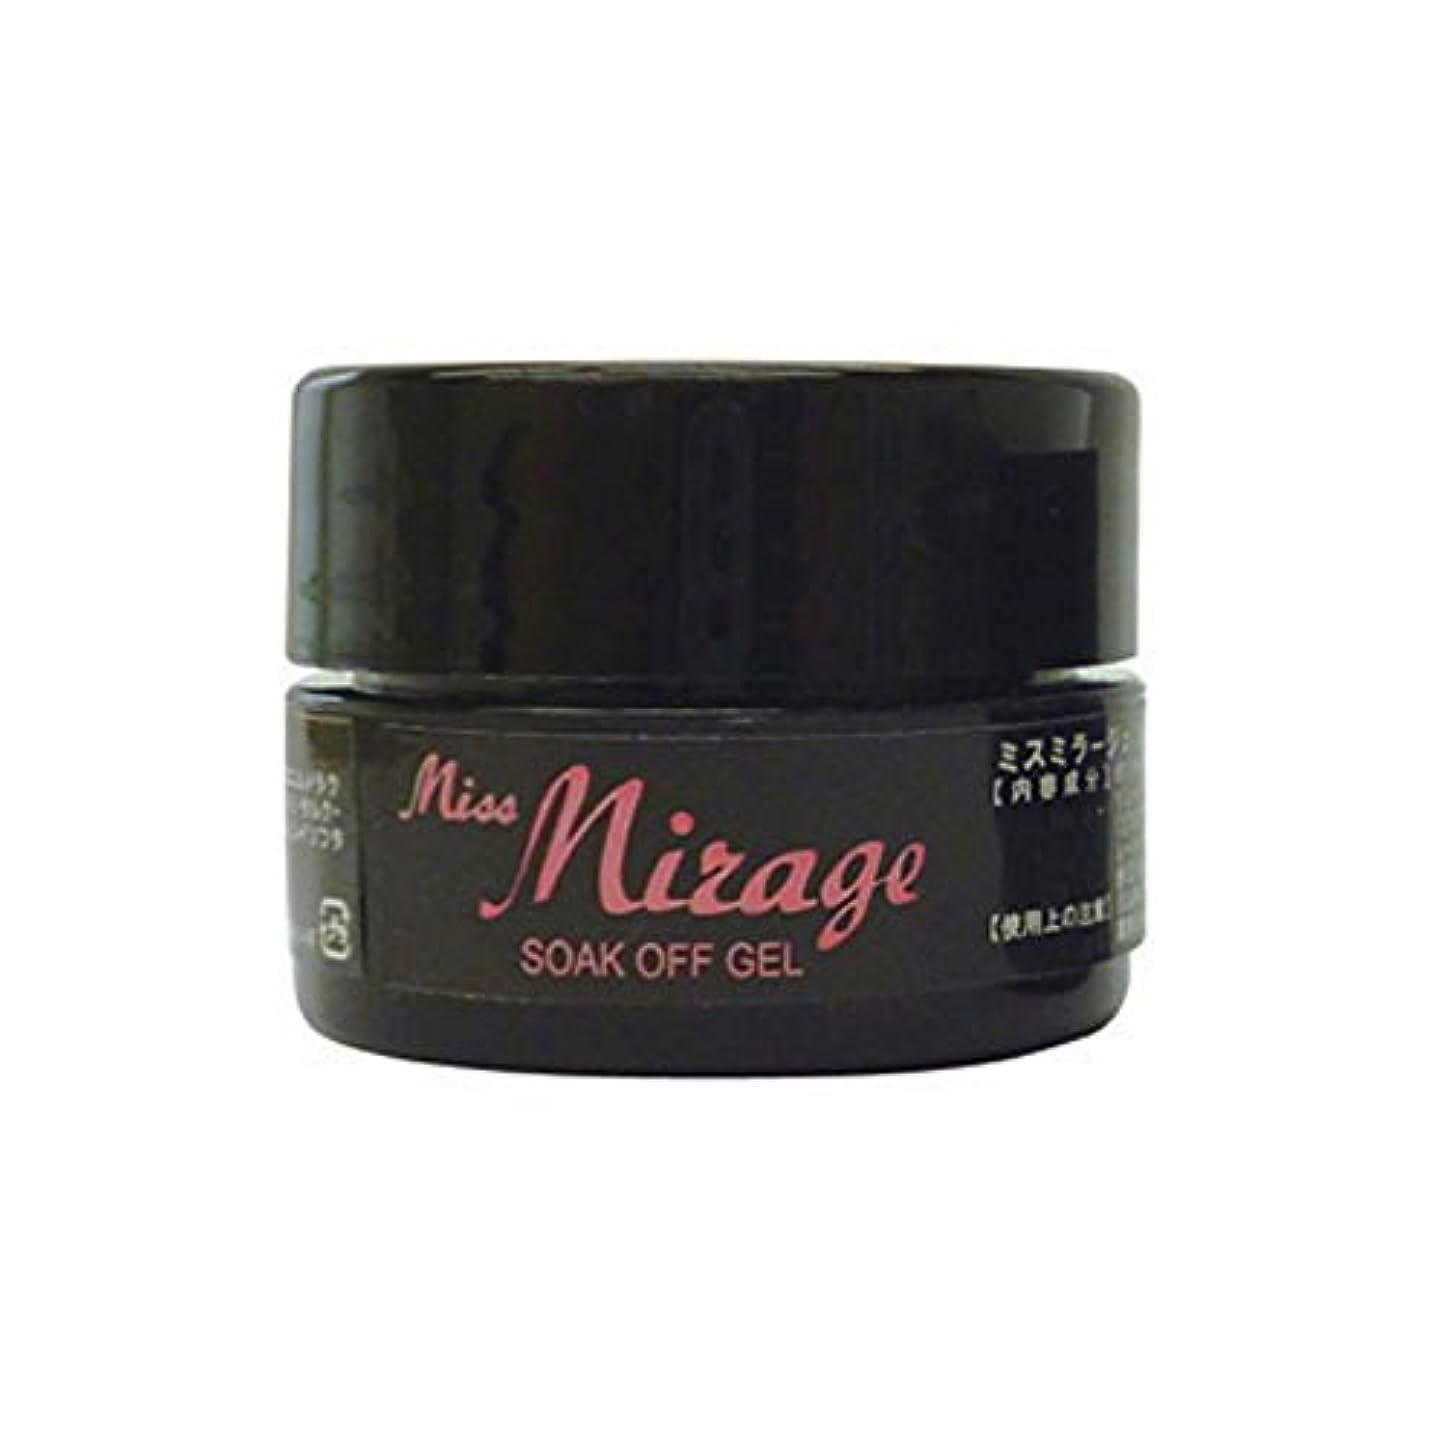 Miss Mirage カラージェル NM63S 2.5g ソークオフジェル UV/LED対応